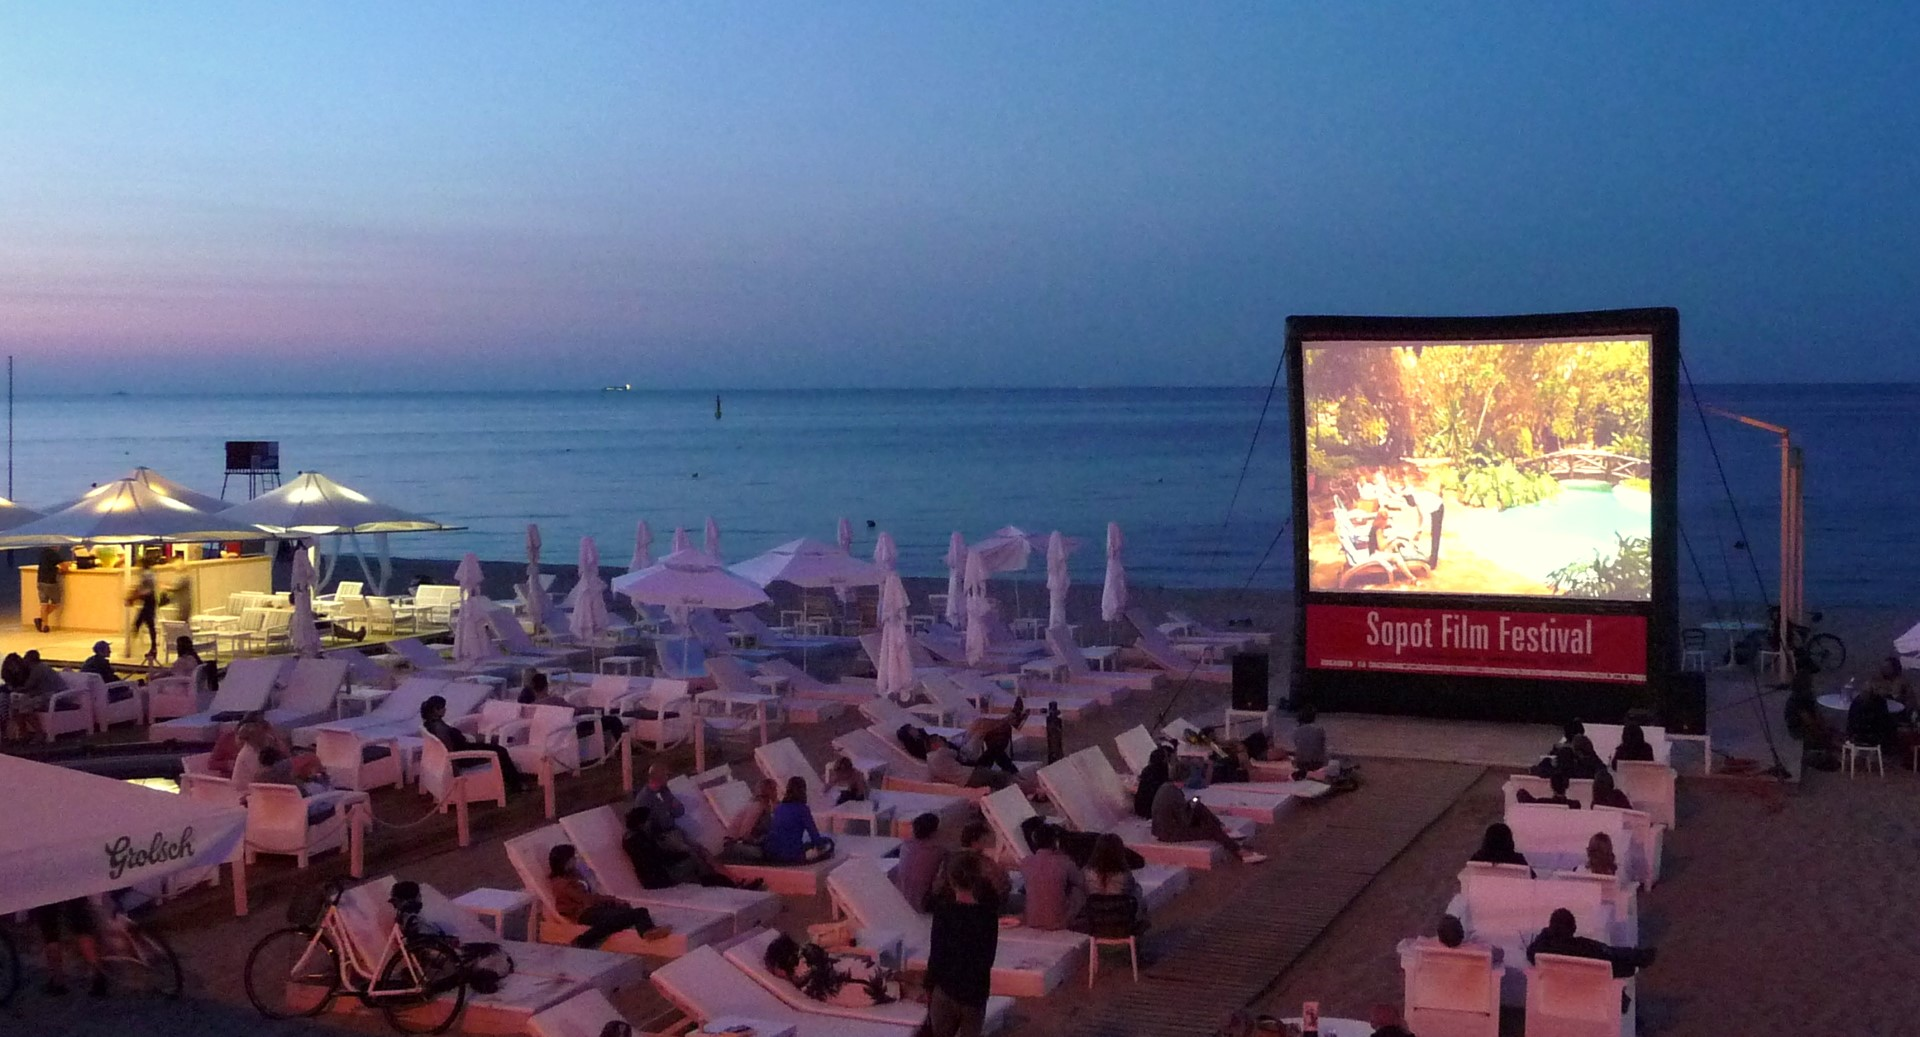 14. Sopot Film Festival